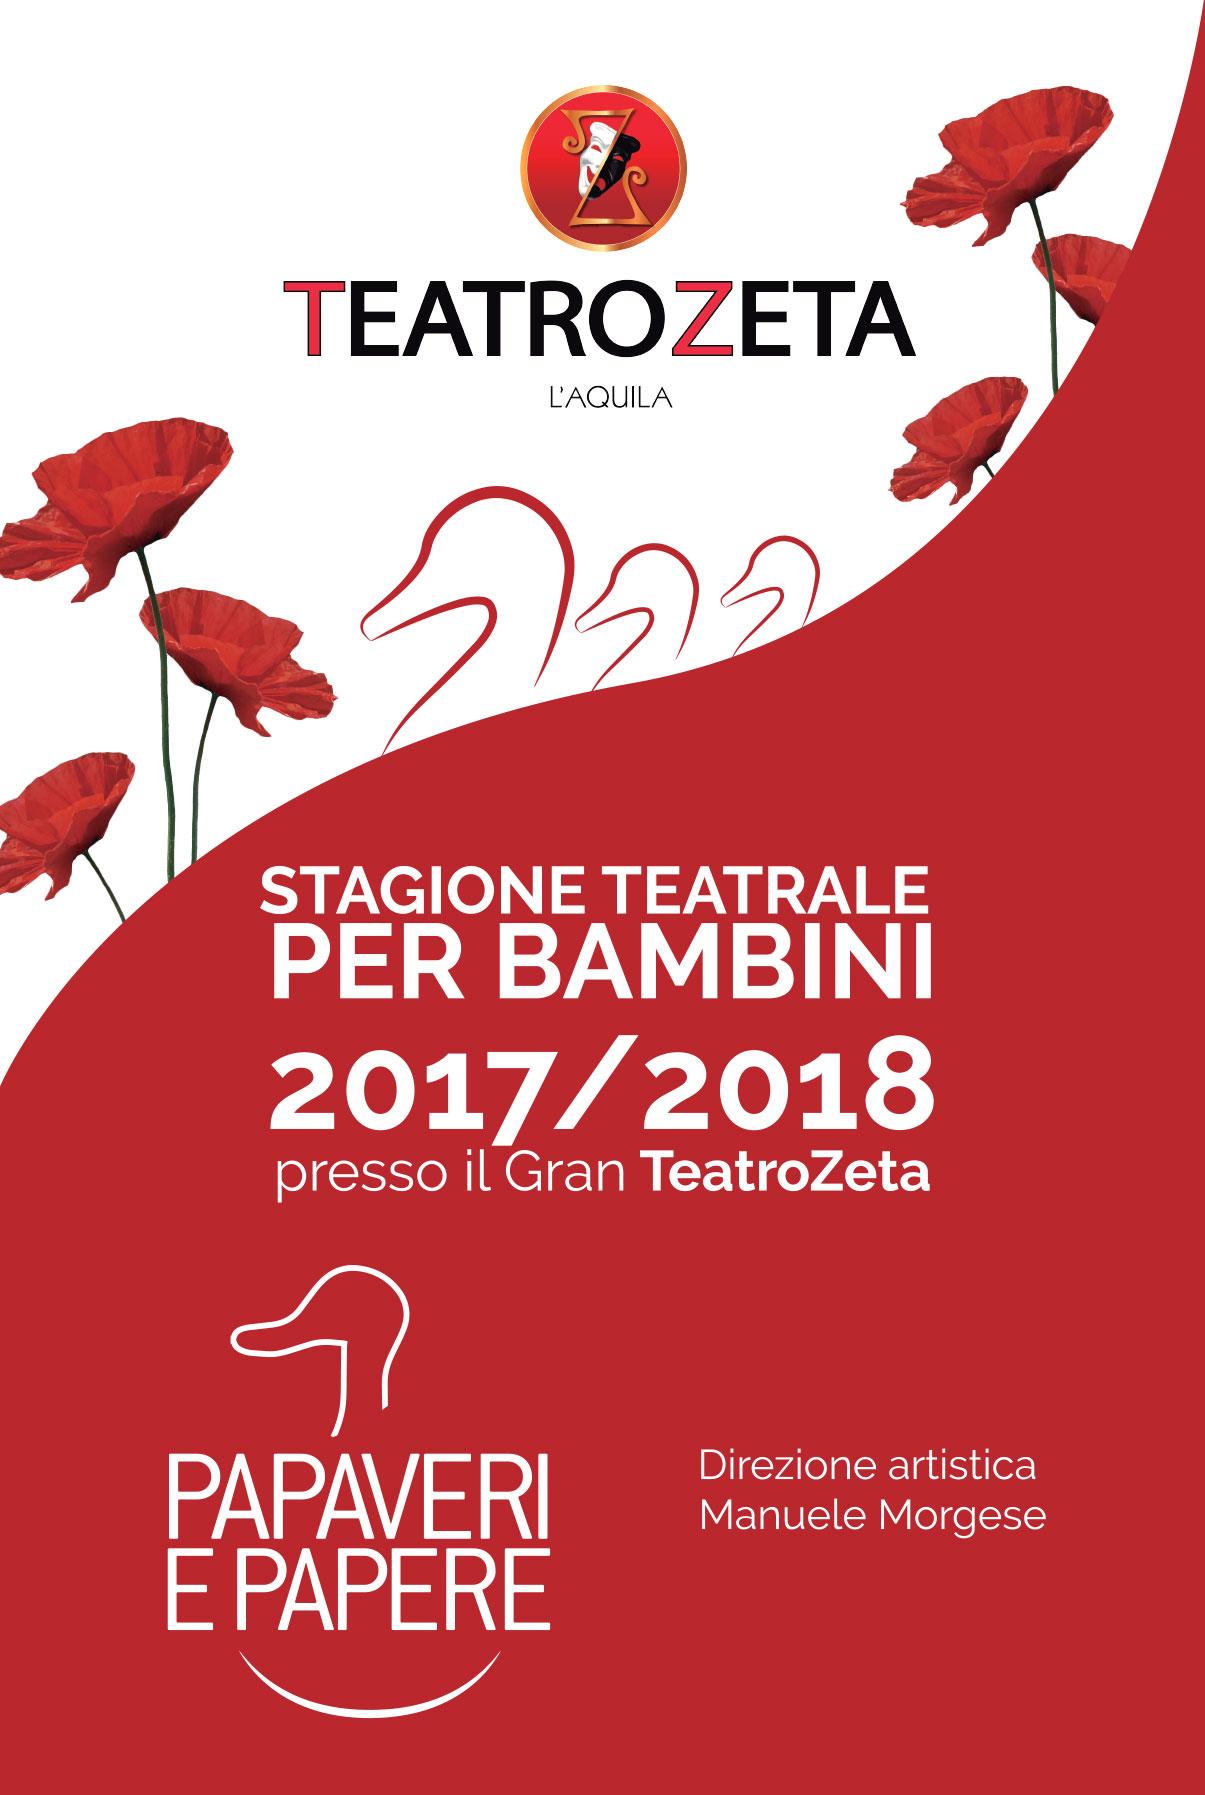 flyer_teatrozera_stampa-1